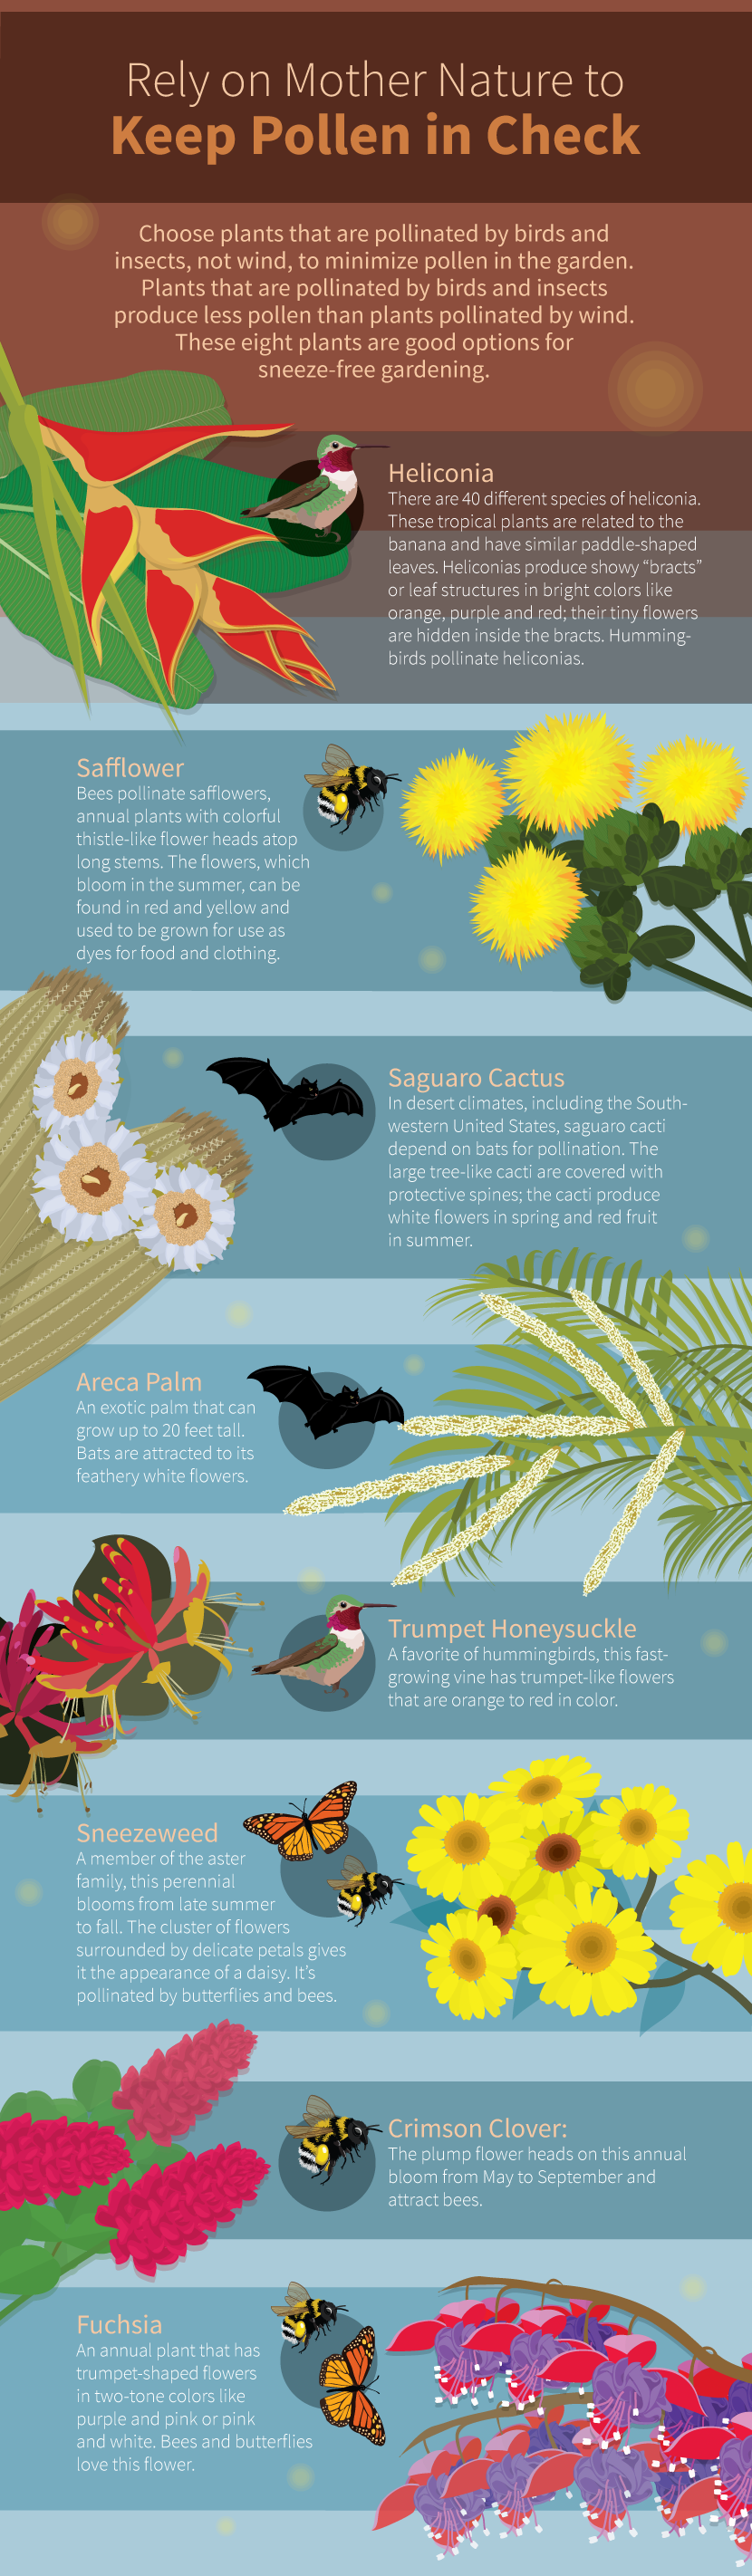 Planting an Allergy.